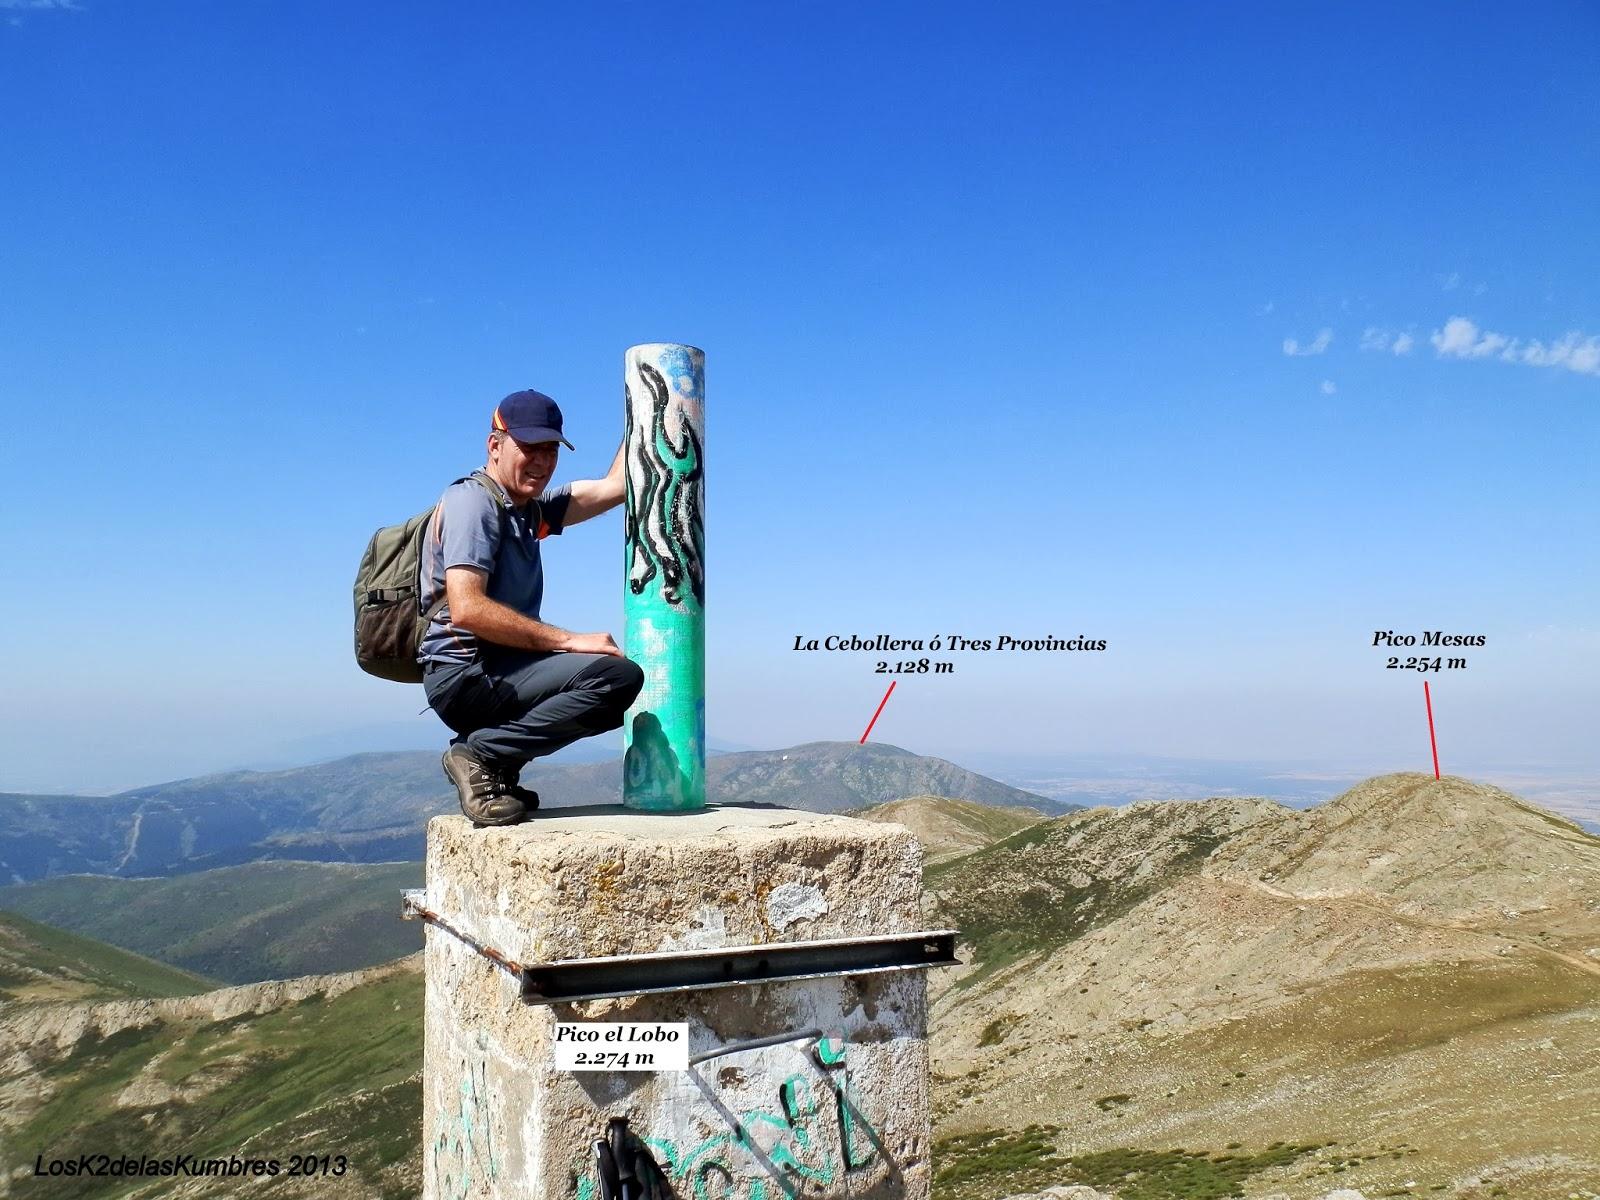 Pico del Lobo